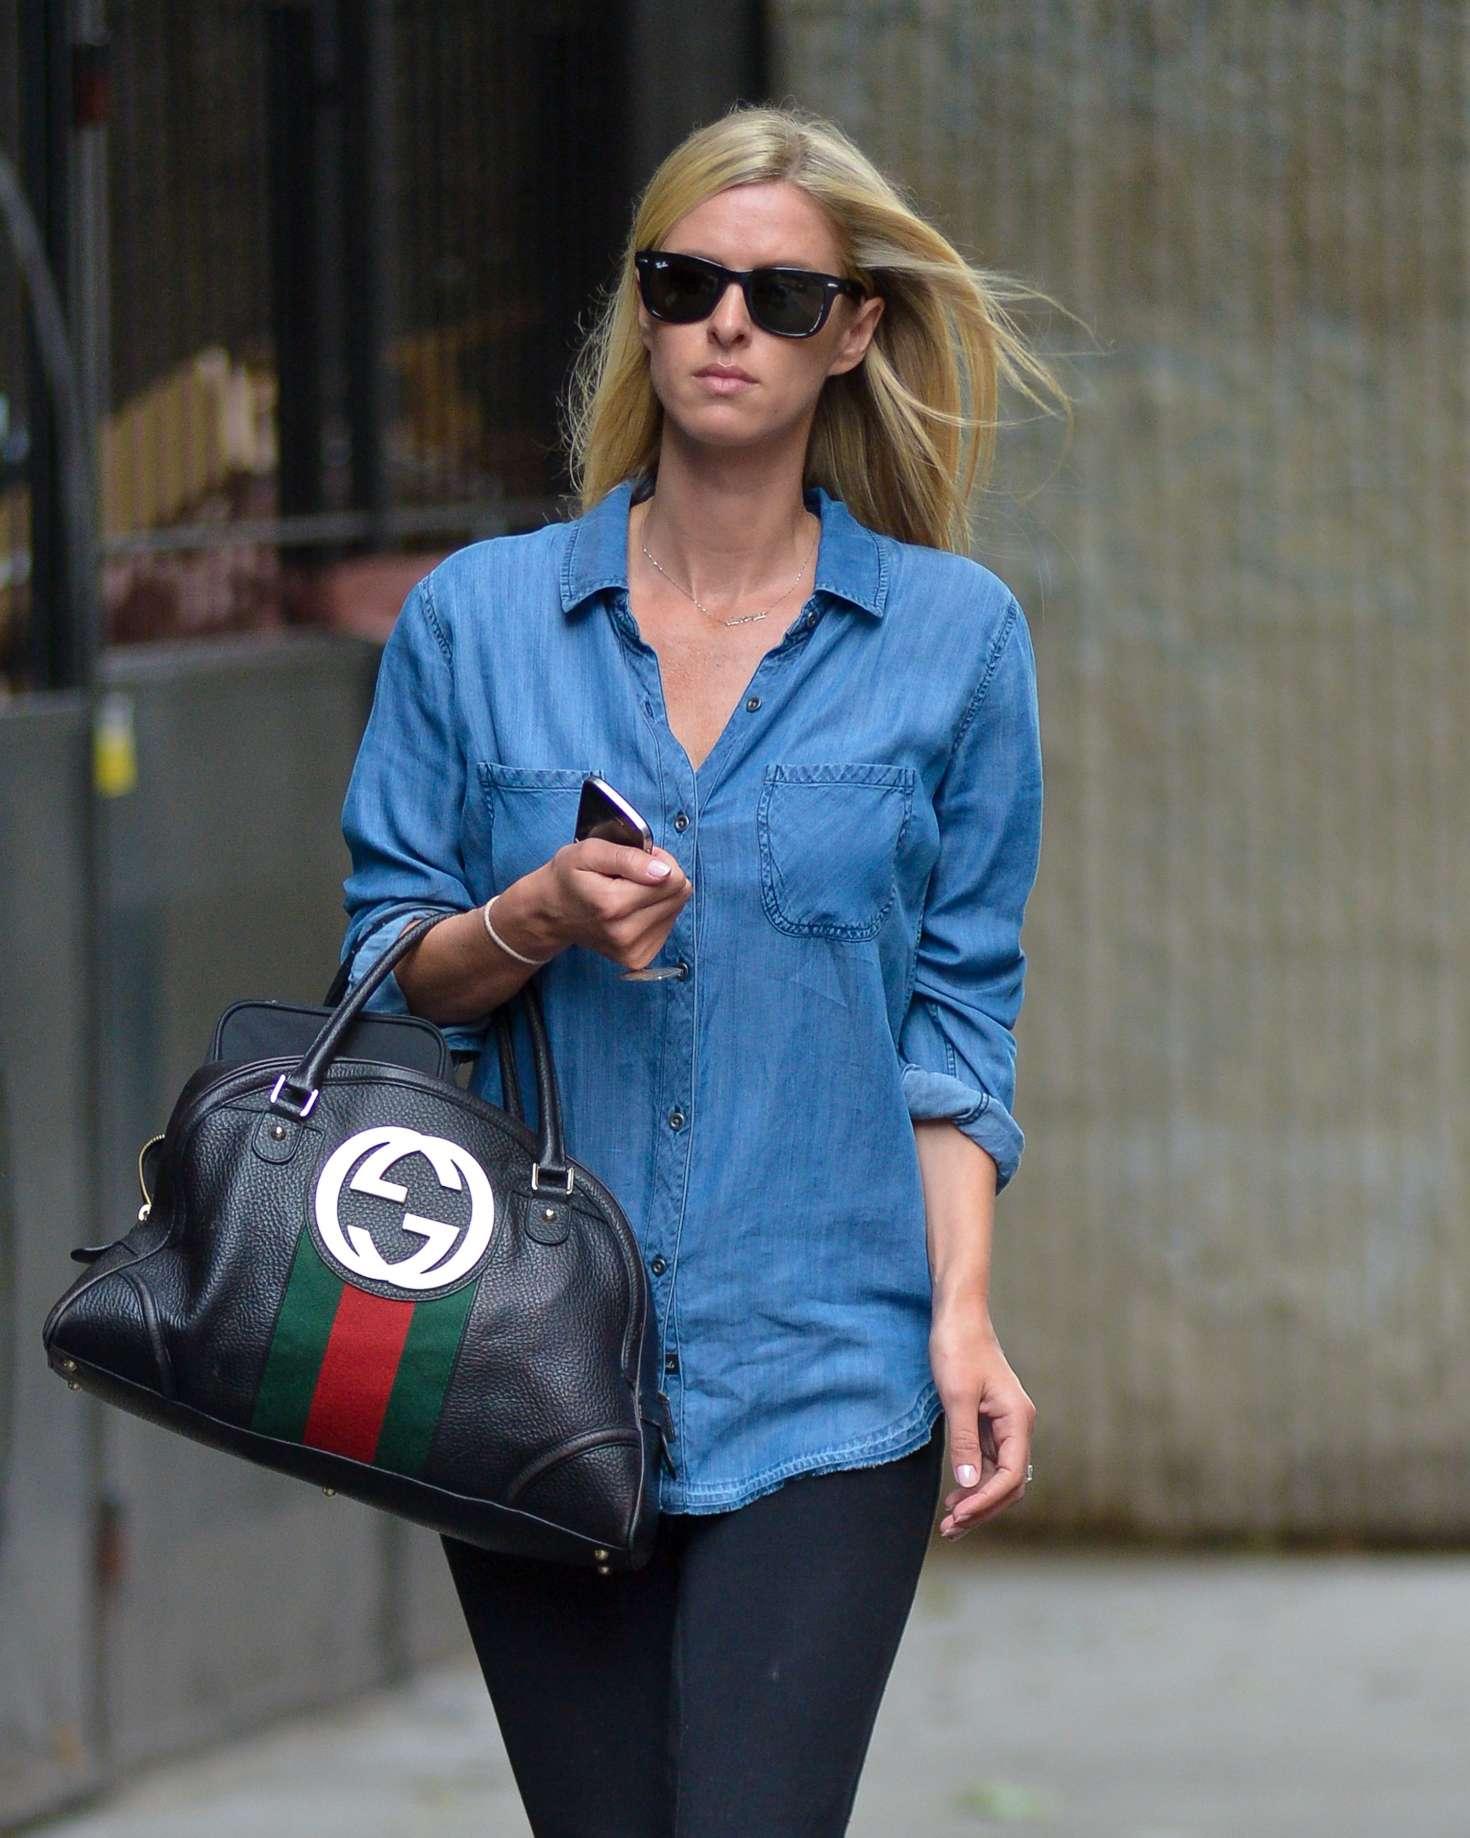 Nicky Hilton in denim shirt out in Manhattan